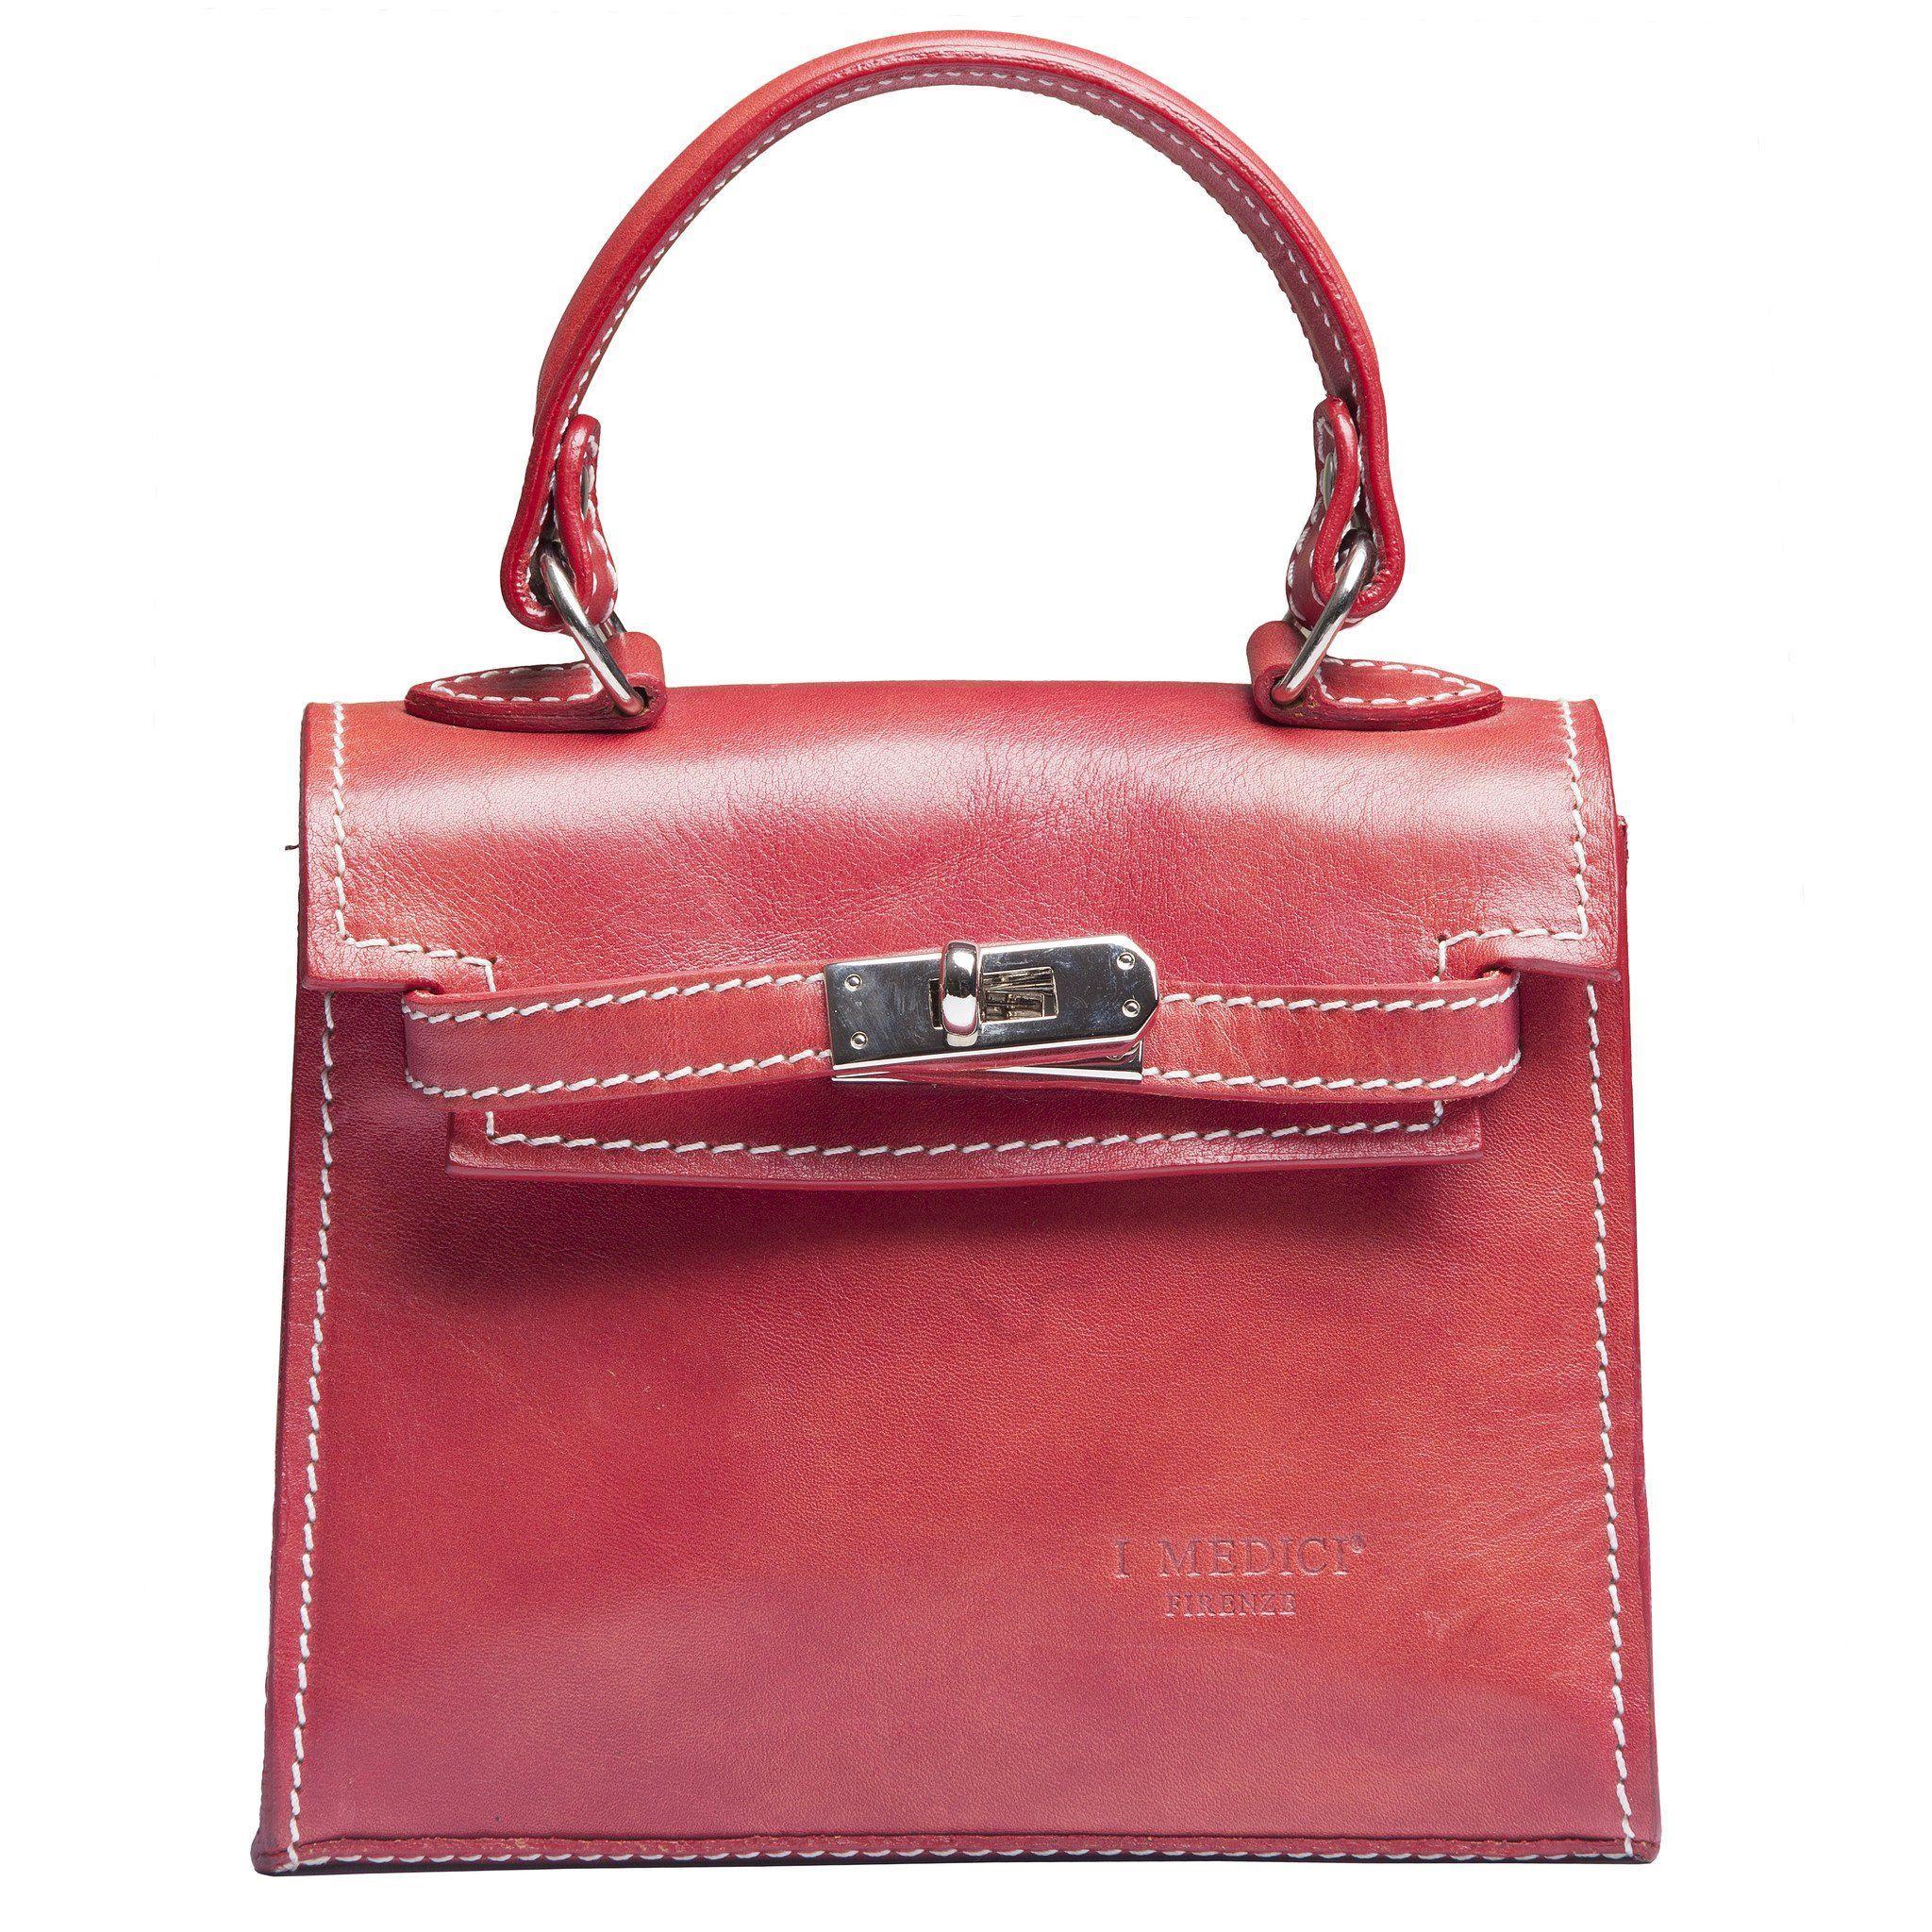 97a2a8db873d I Medici Genuine Italian Leather Handbag 1900